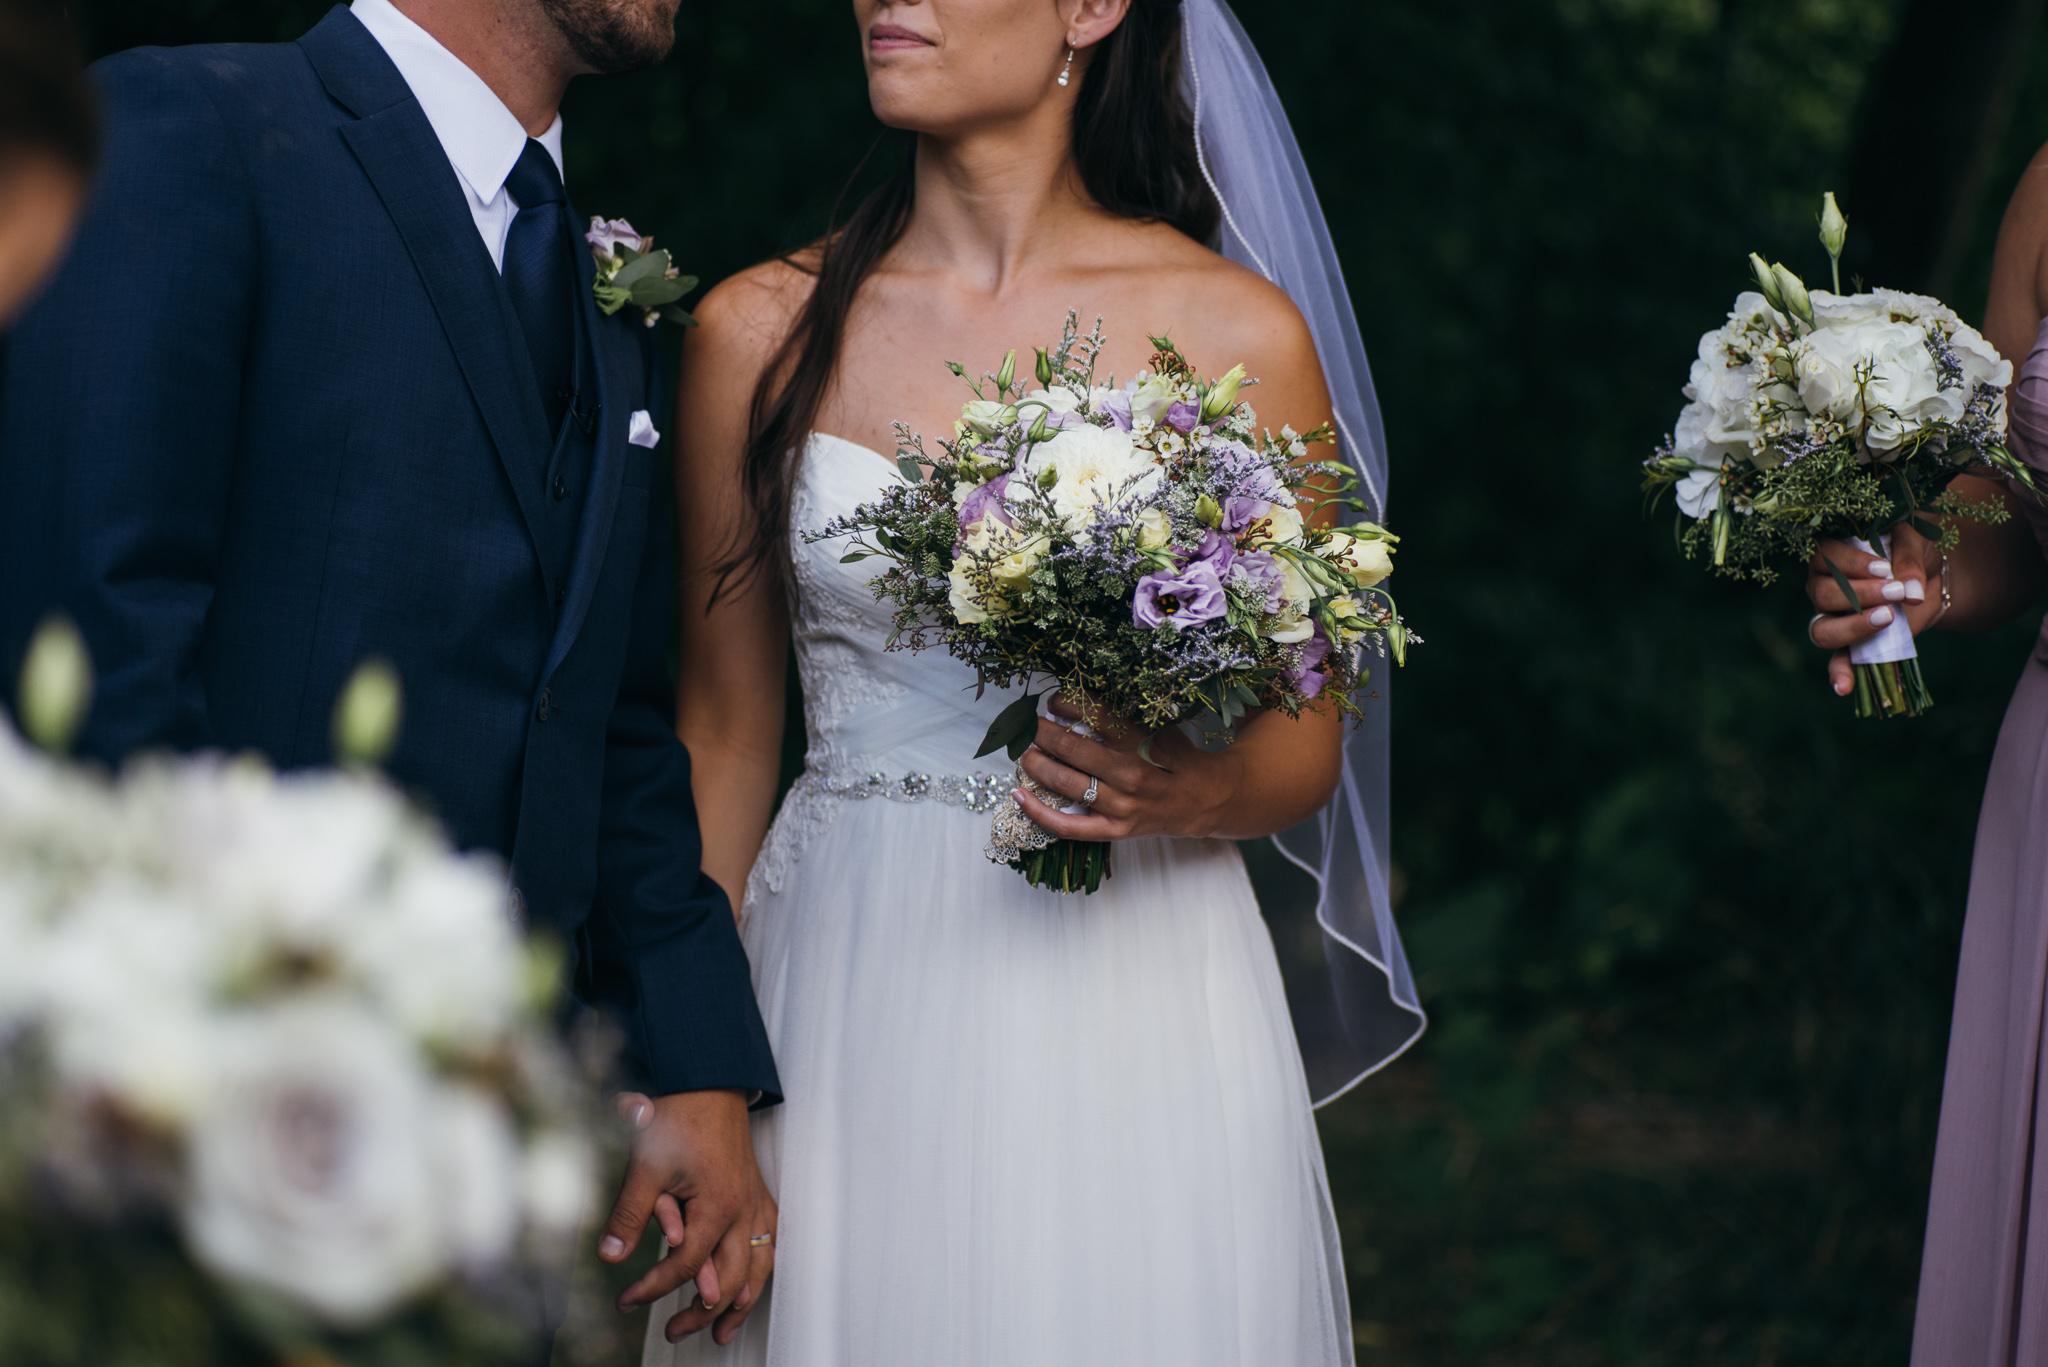 springer-house-burlington-wedding-photographer-321-of-756.jpg